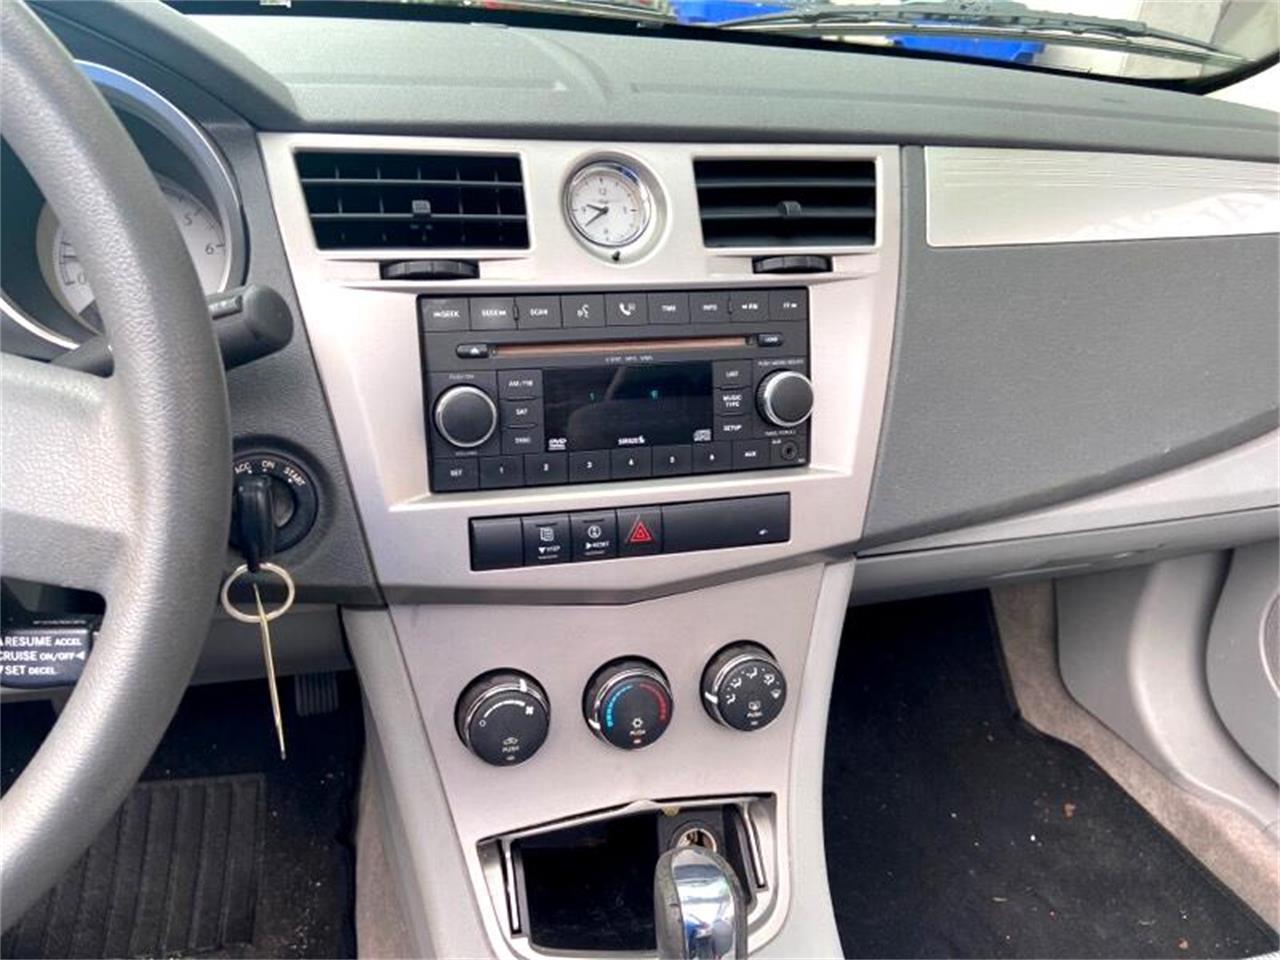 2008 Chrysler Sebring (CC-1321941) for sale in Tavares, Florida